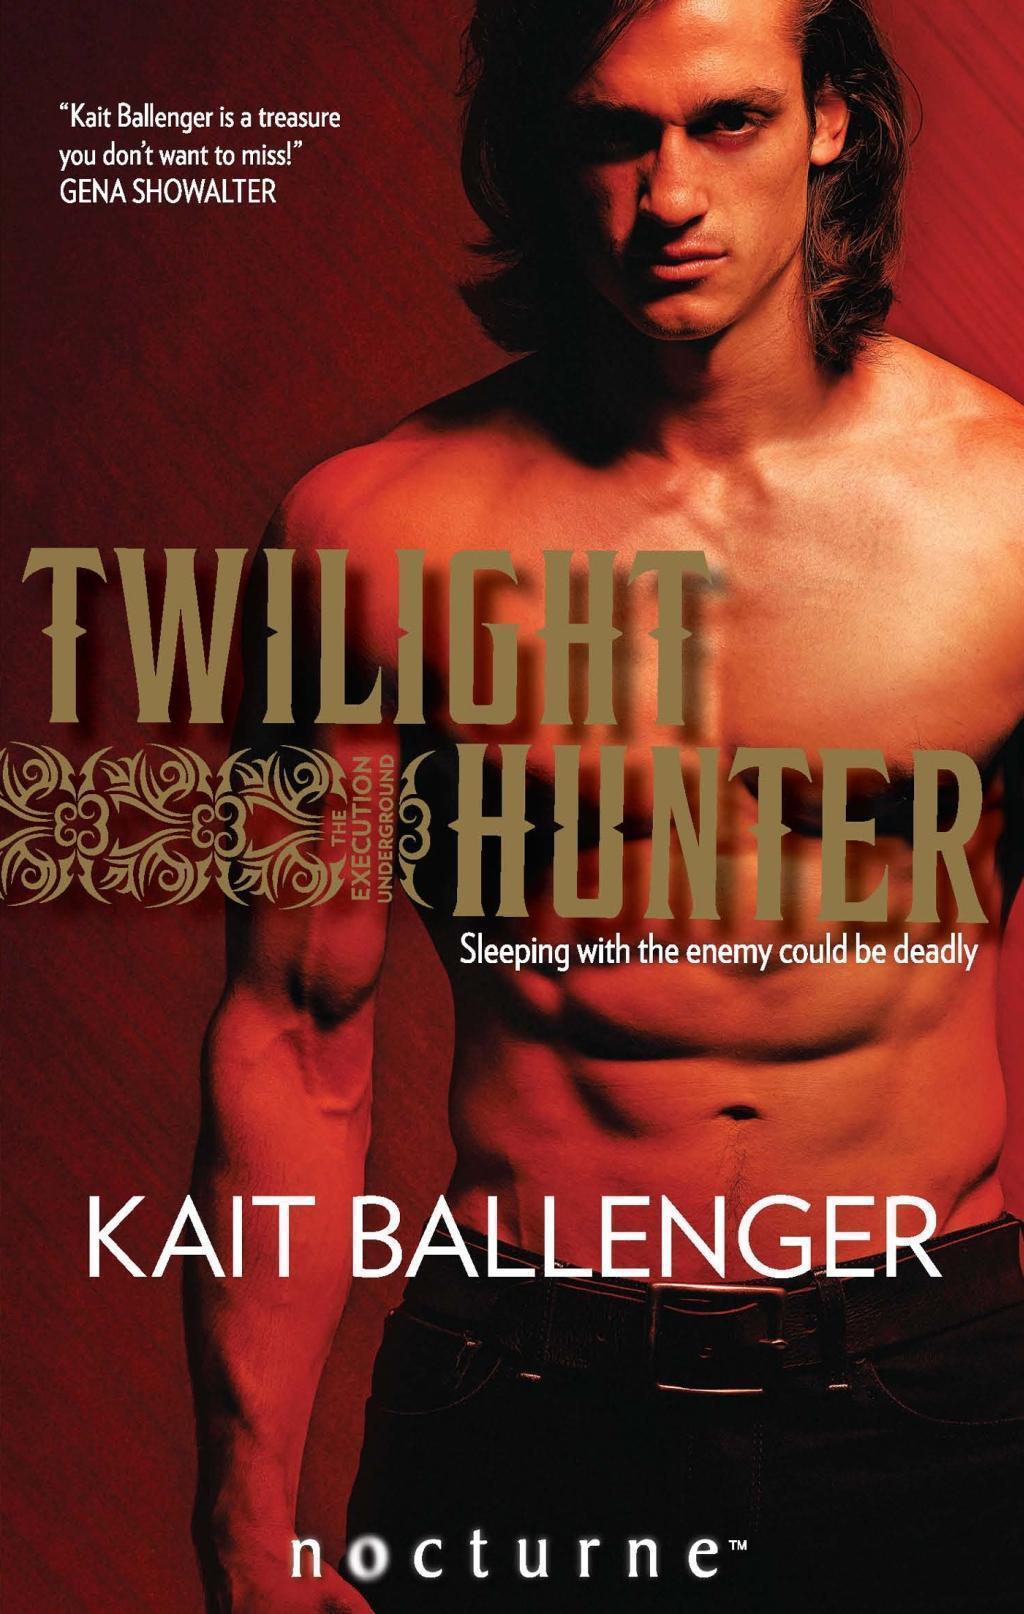 Twilight Hunter (Mills & Boon Nocturne) (The Execution Underground, Book 2)